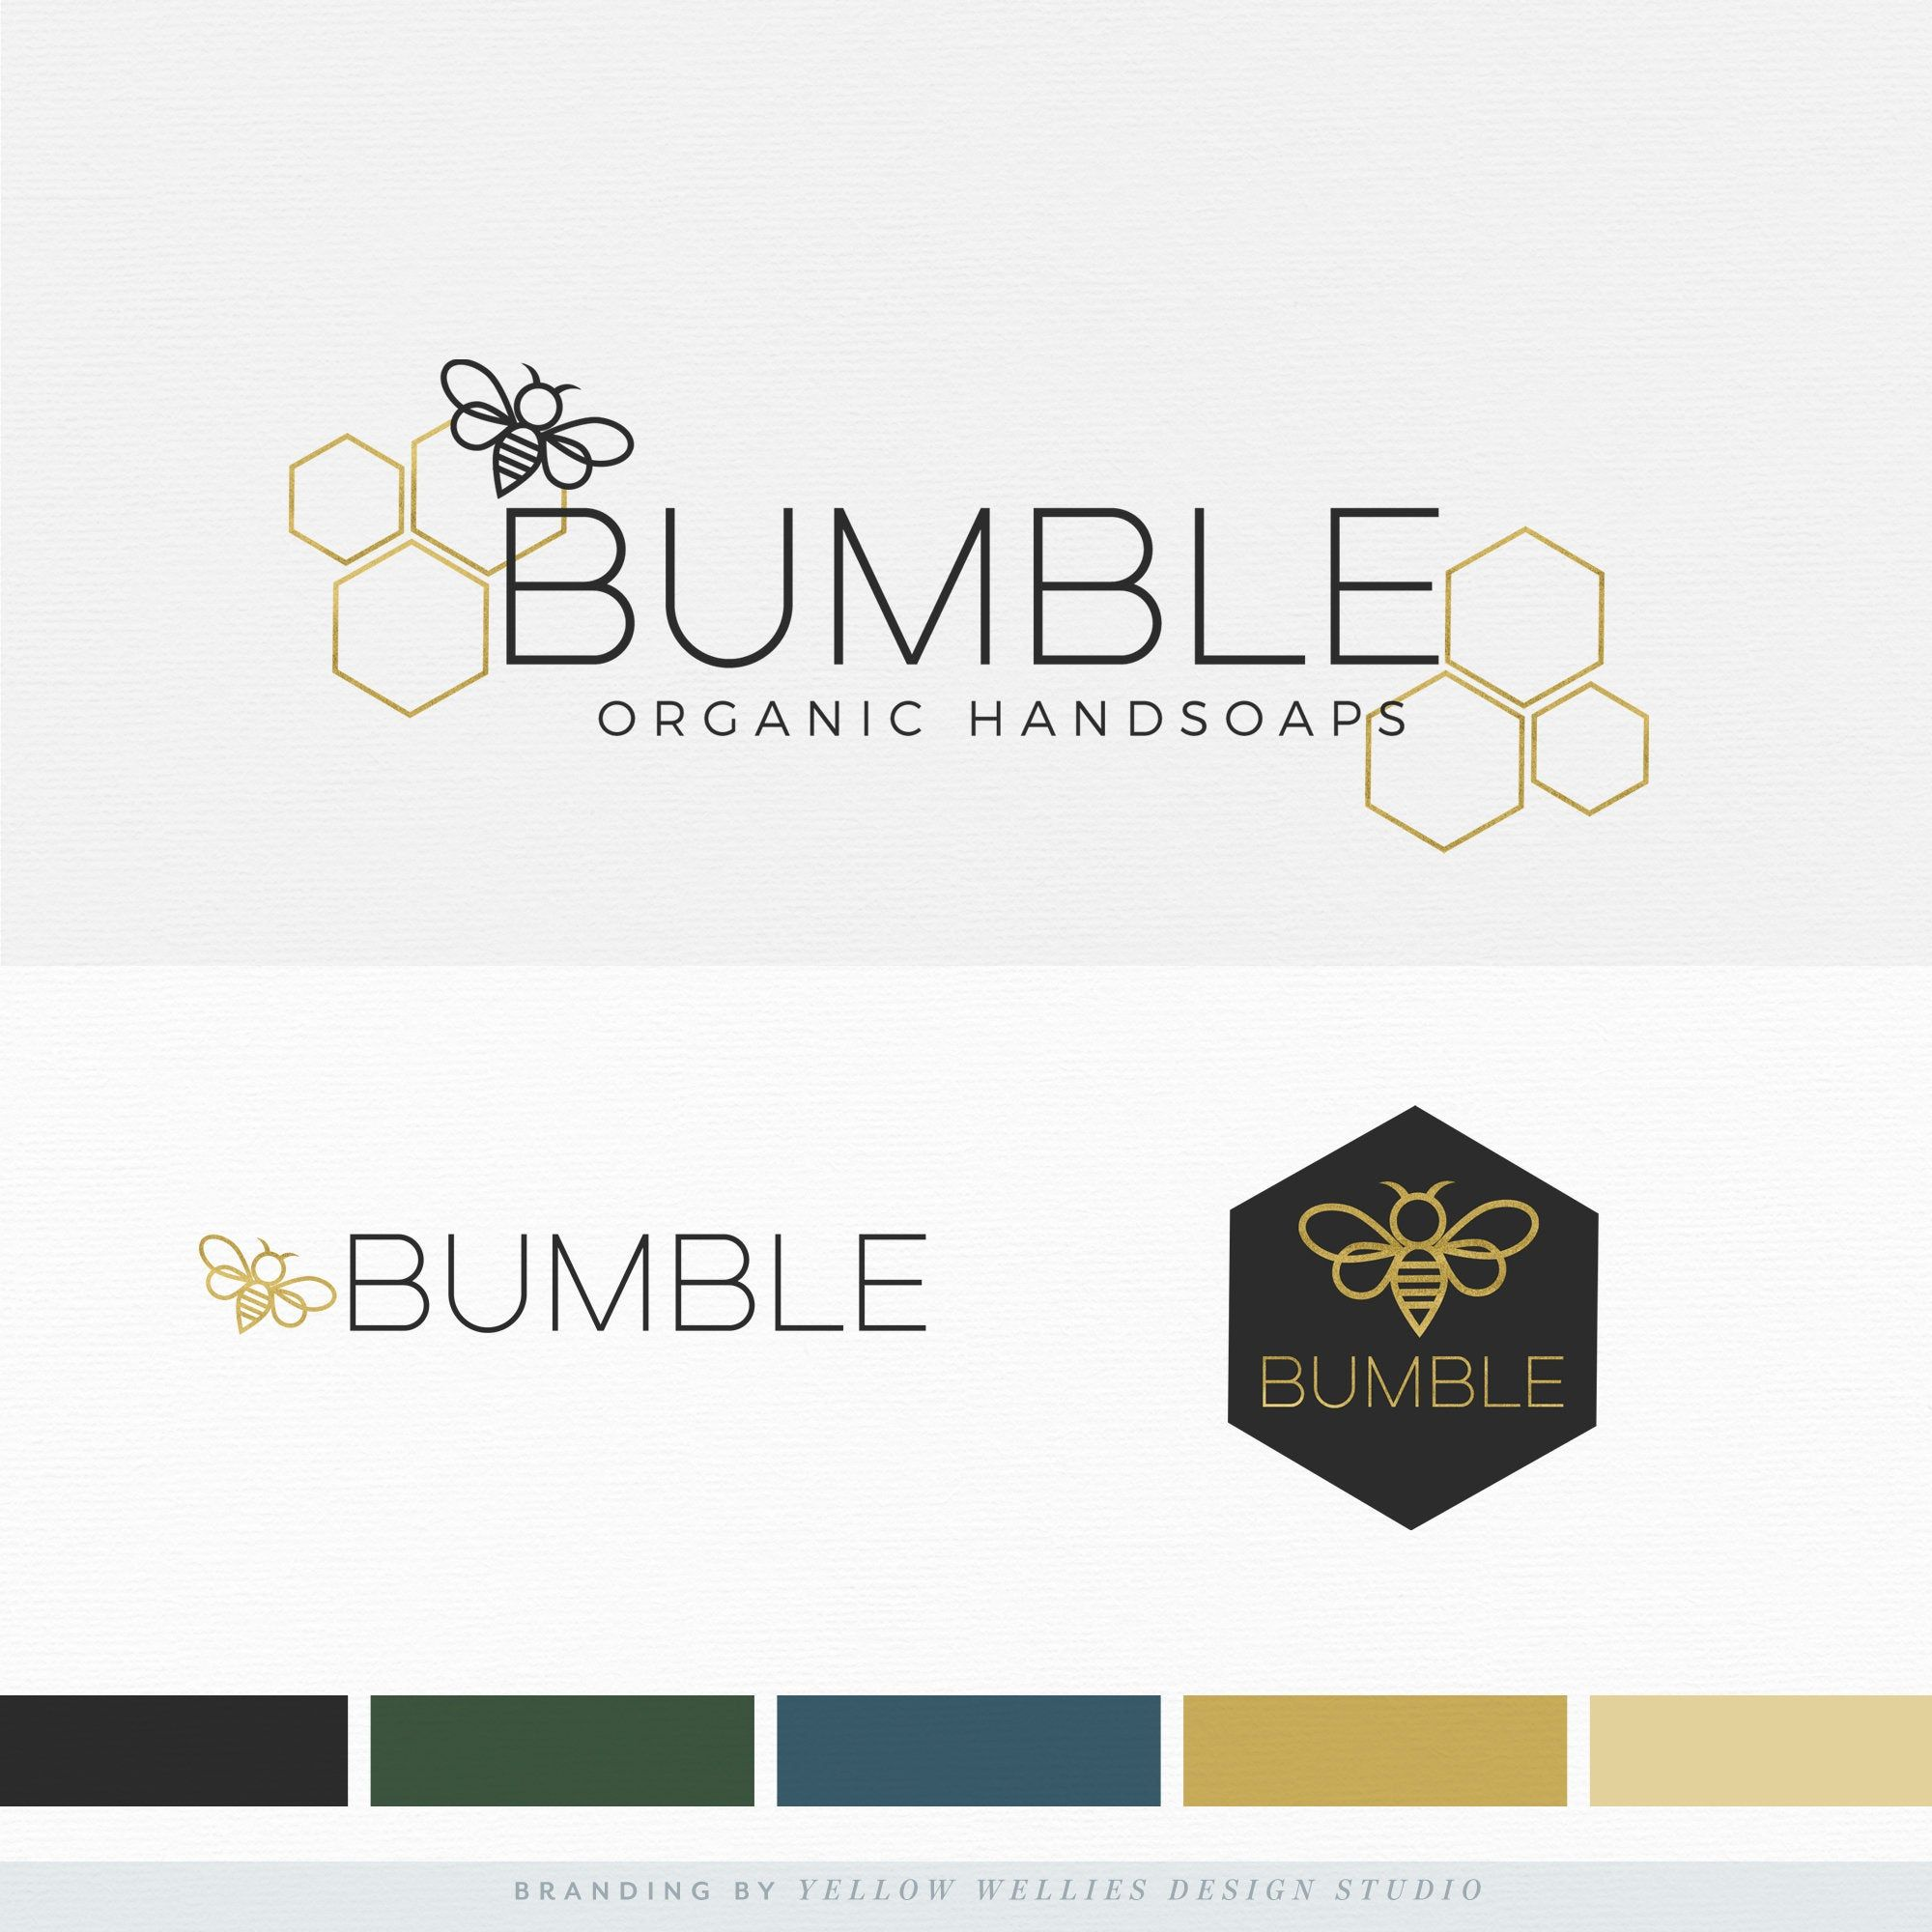 Premade Logo Design Bumble Bee Honey Comb Modern